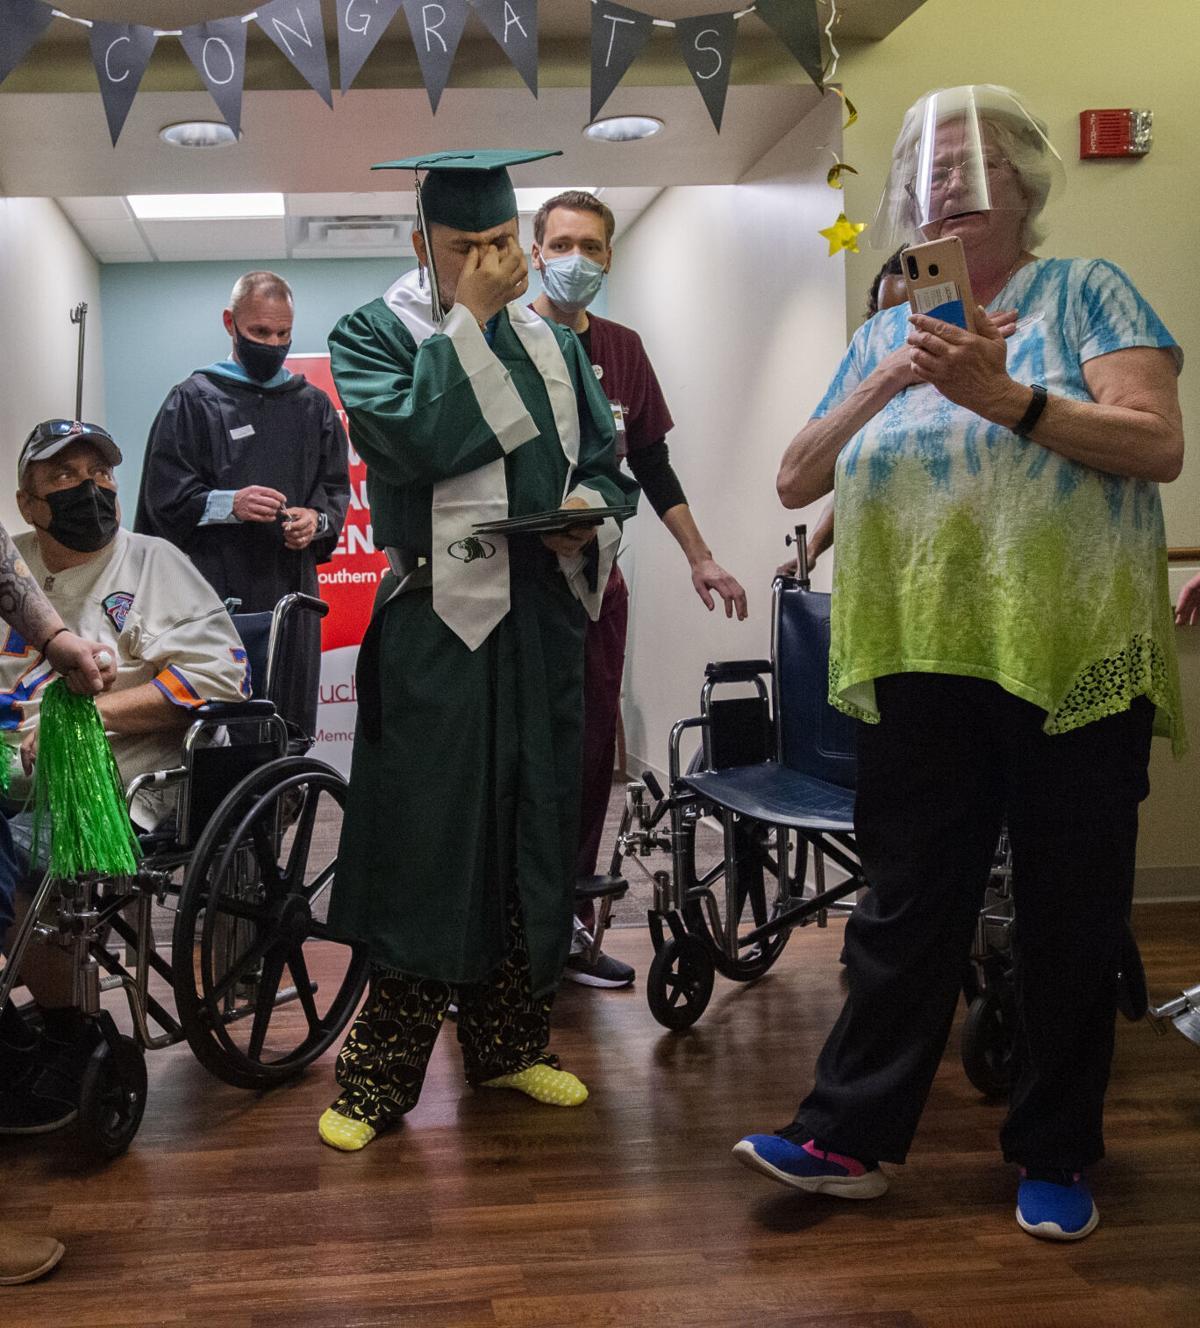 052821-news-hospital-graduation 2.jpg